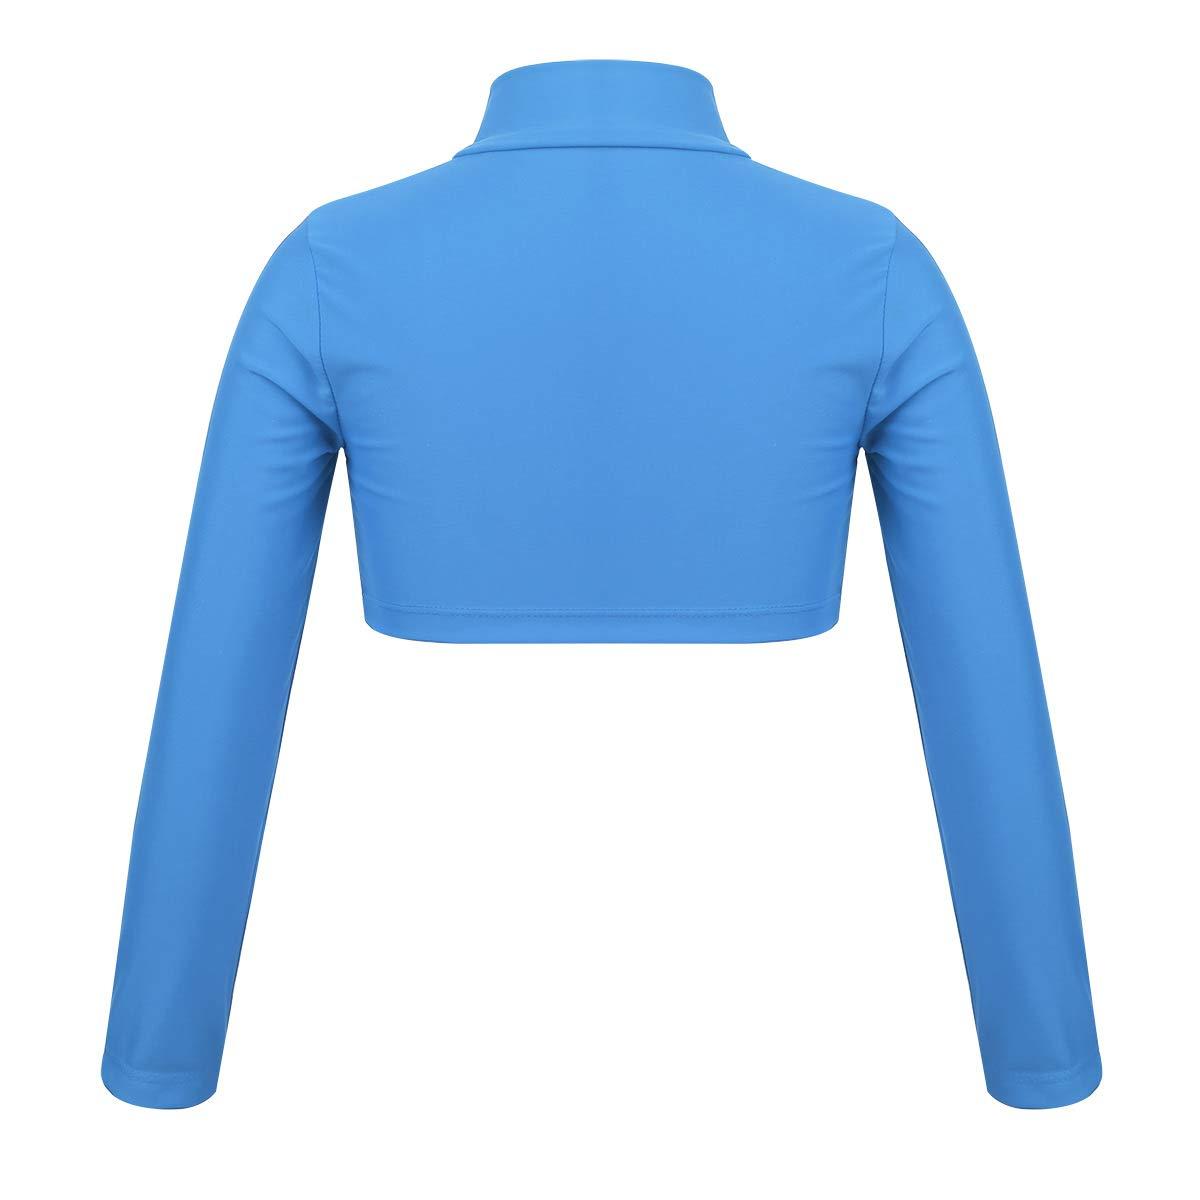 zdhoor Kids Girls Long Sleeves Crop Top Basic Tight Yoga Costume Mock Neck Dancewear Athletic Sportswear